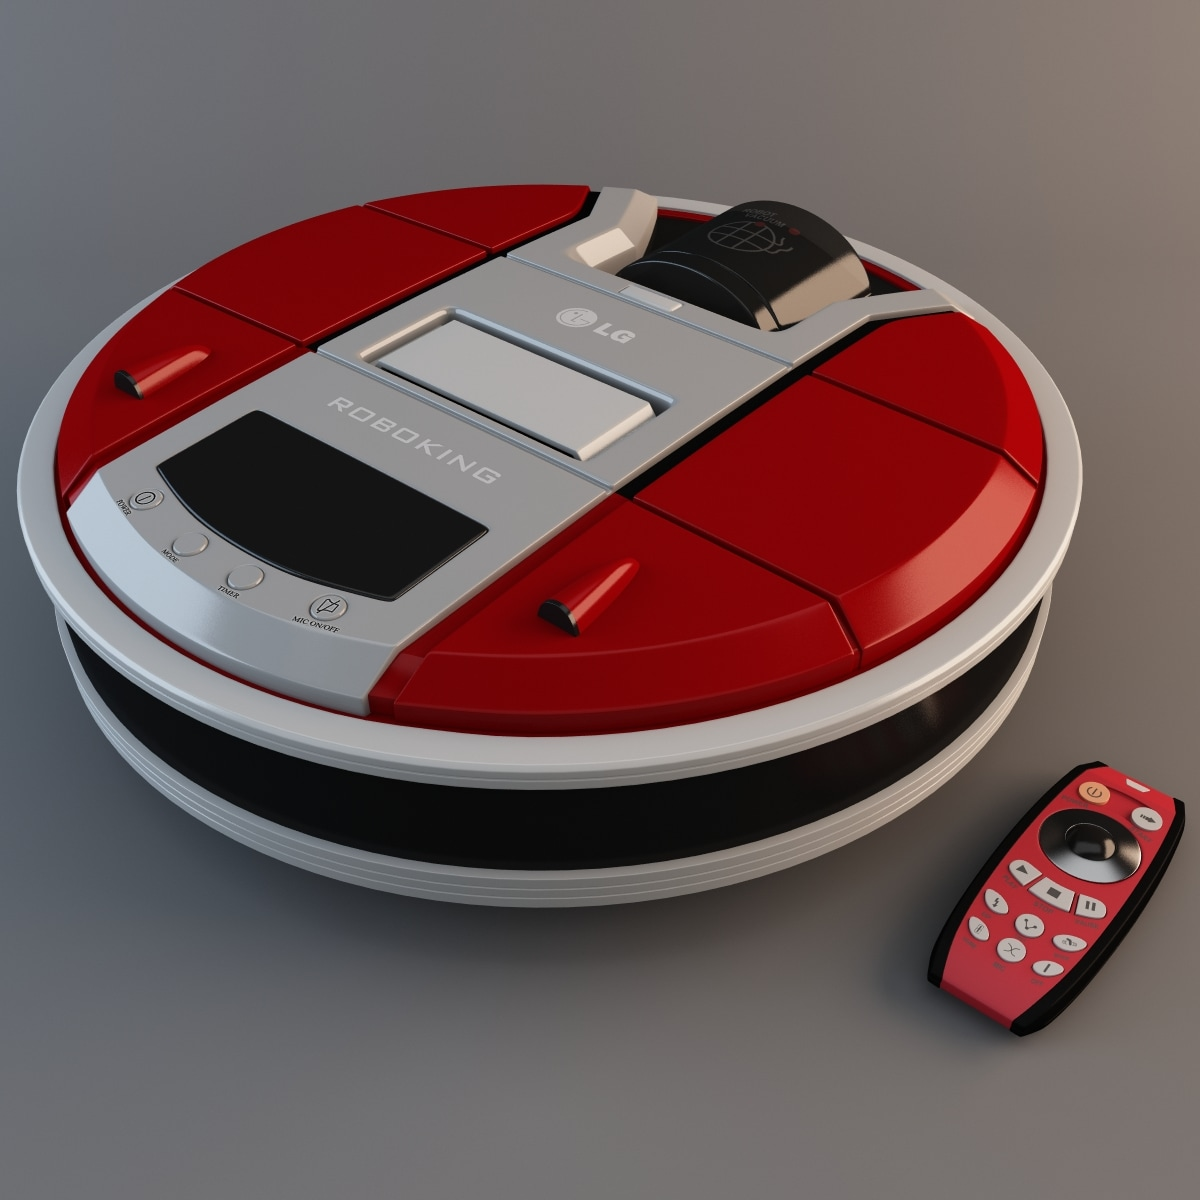 LG_Robot_Vacuum_Cleaner_R4000_Set_002.jpg